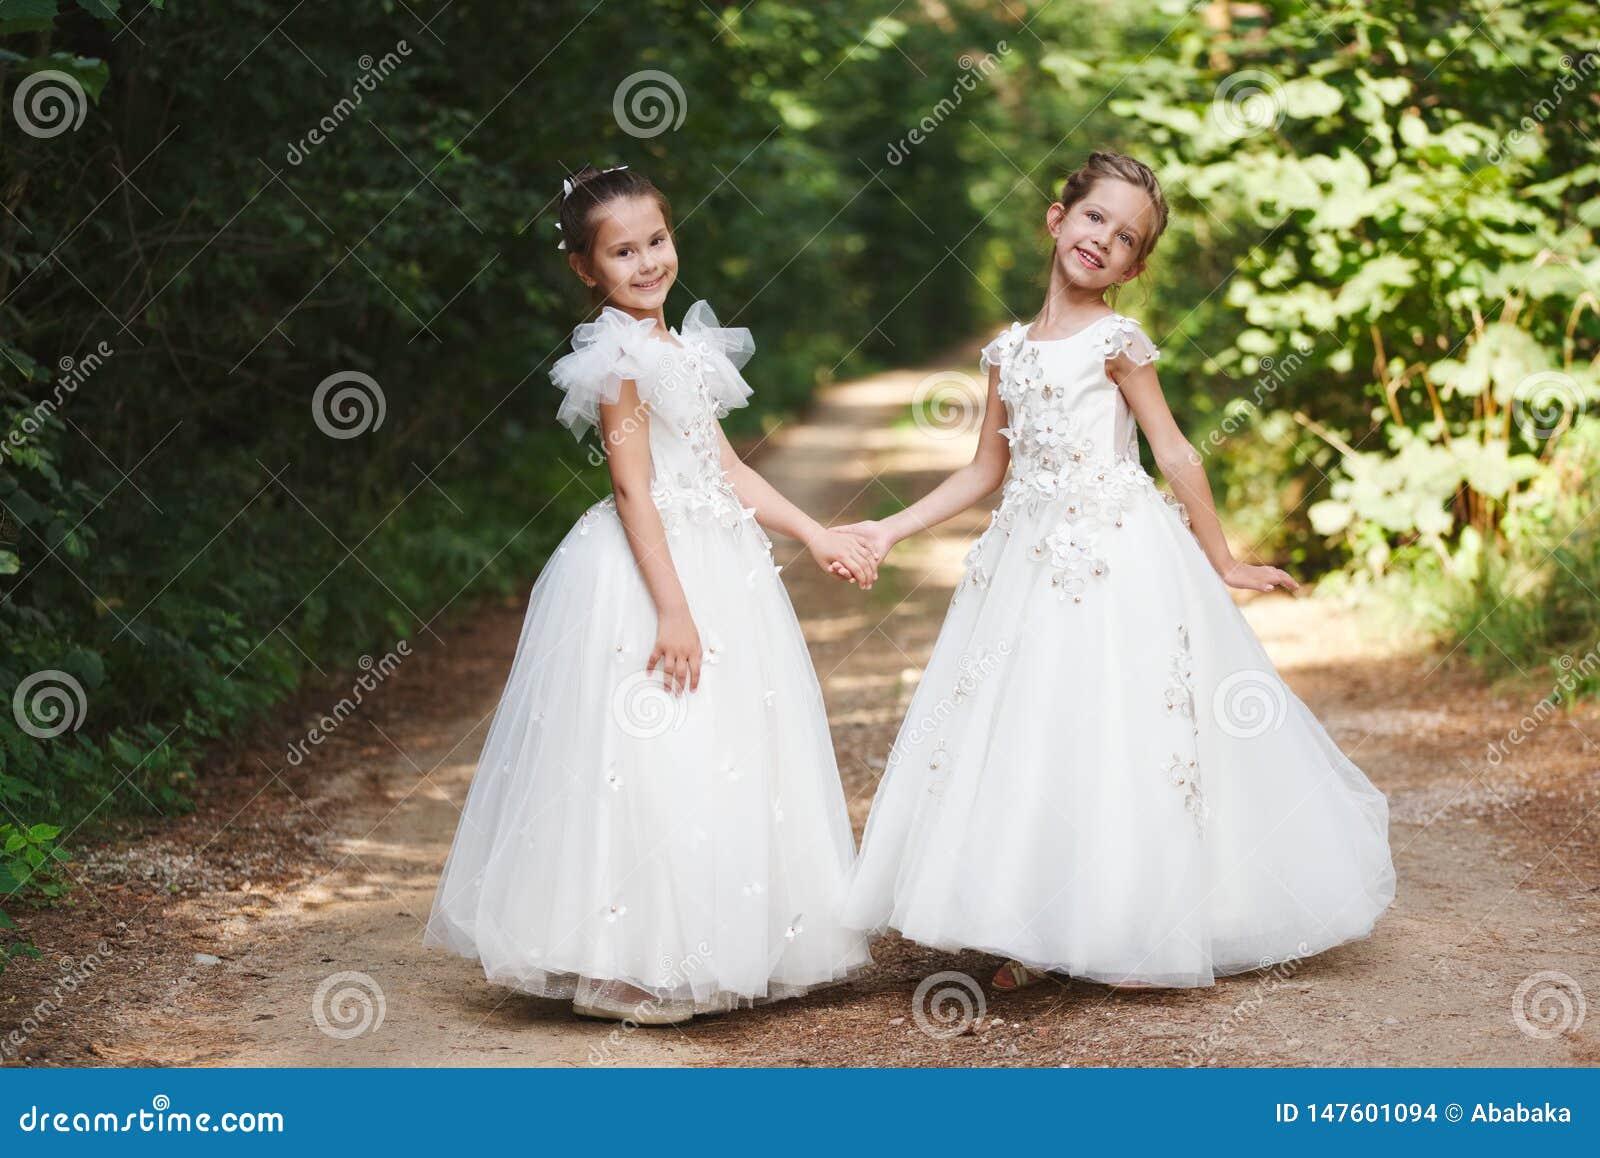 Happy Beautiful Girls With White Wedding Dresses Stock Photo Image Of Girls Forest 147601094,Wedding Dress Makers Sydney